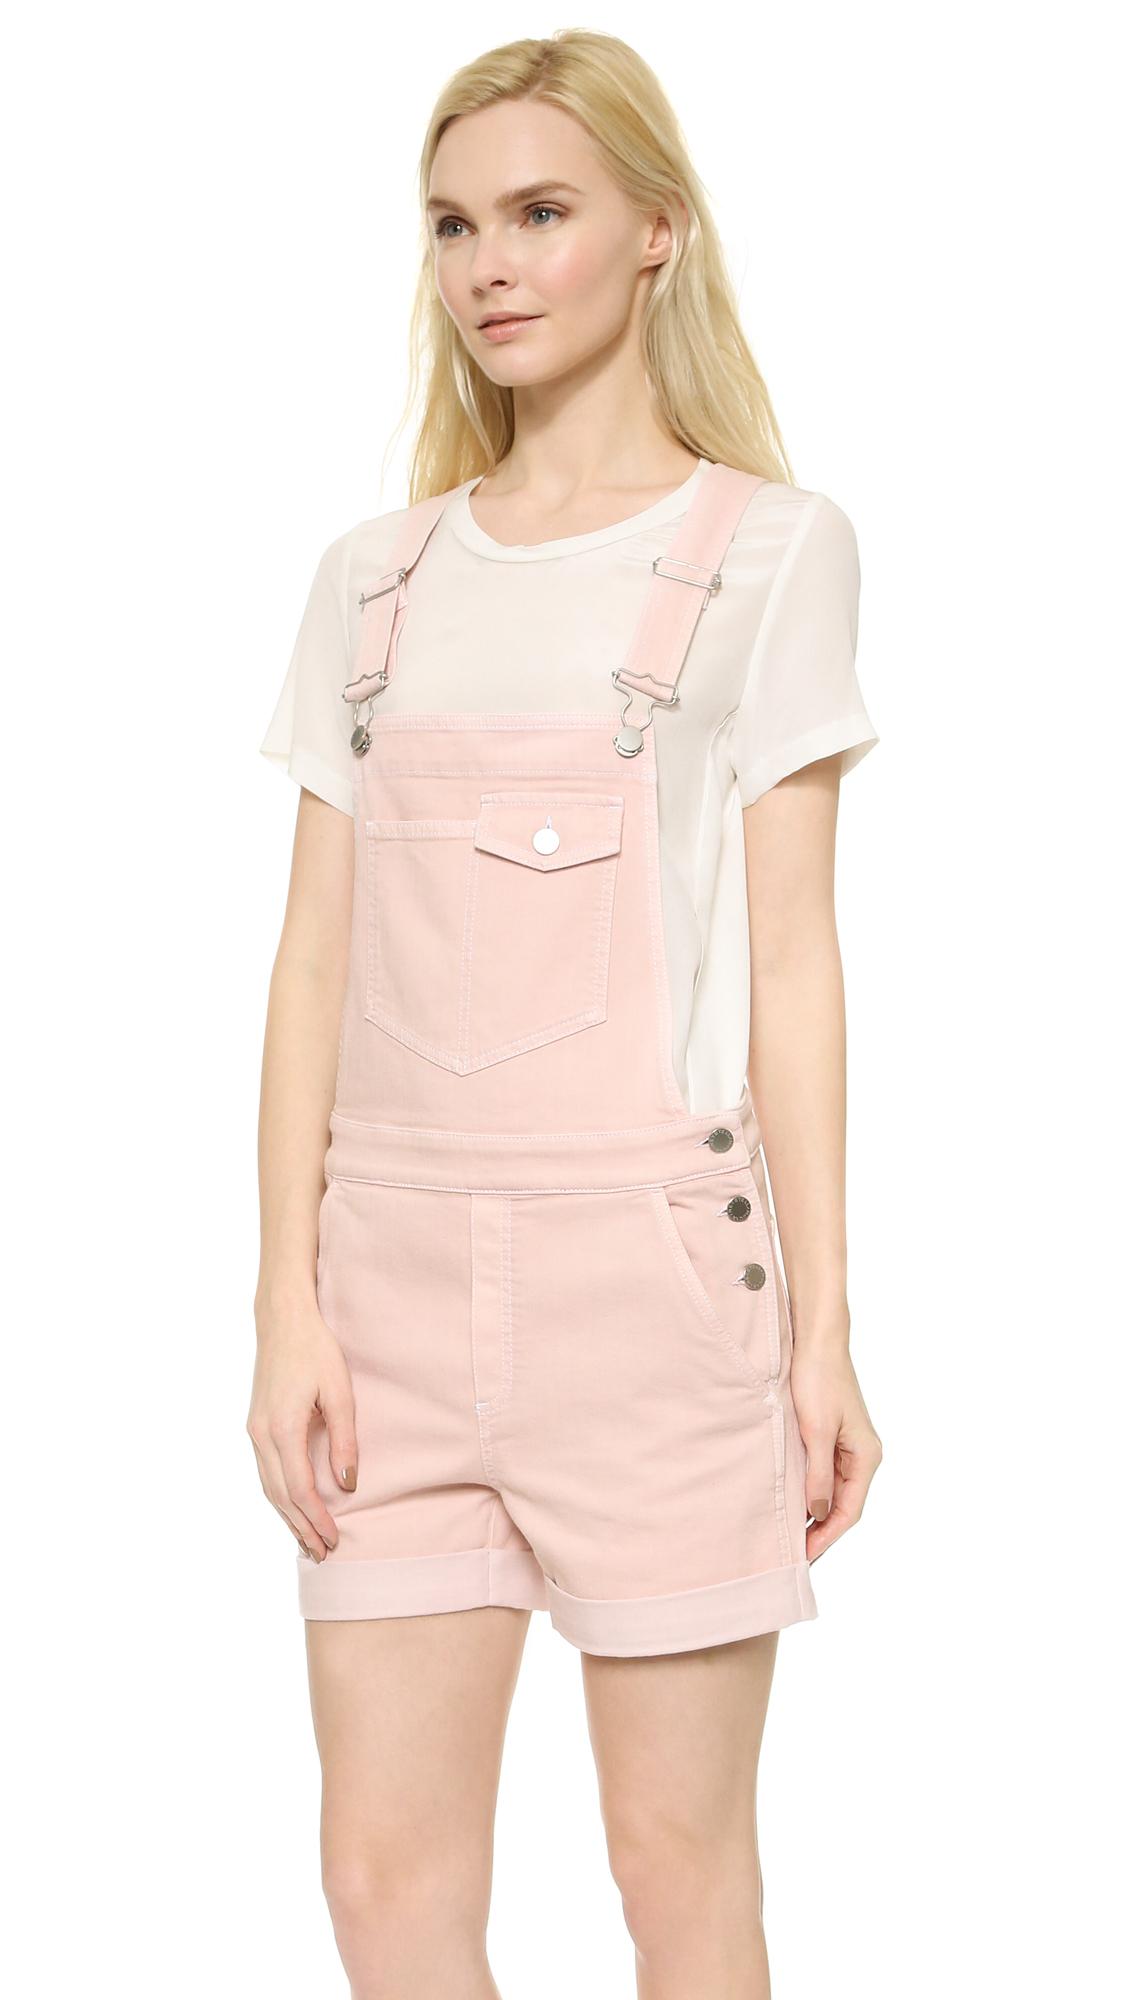 Stella Mccartney Denim Overall Shorts Light Pink Lyst